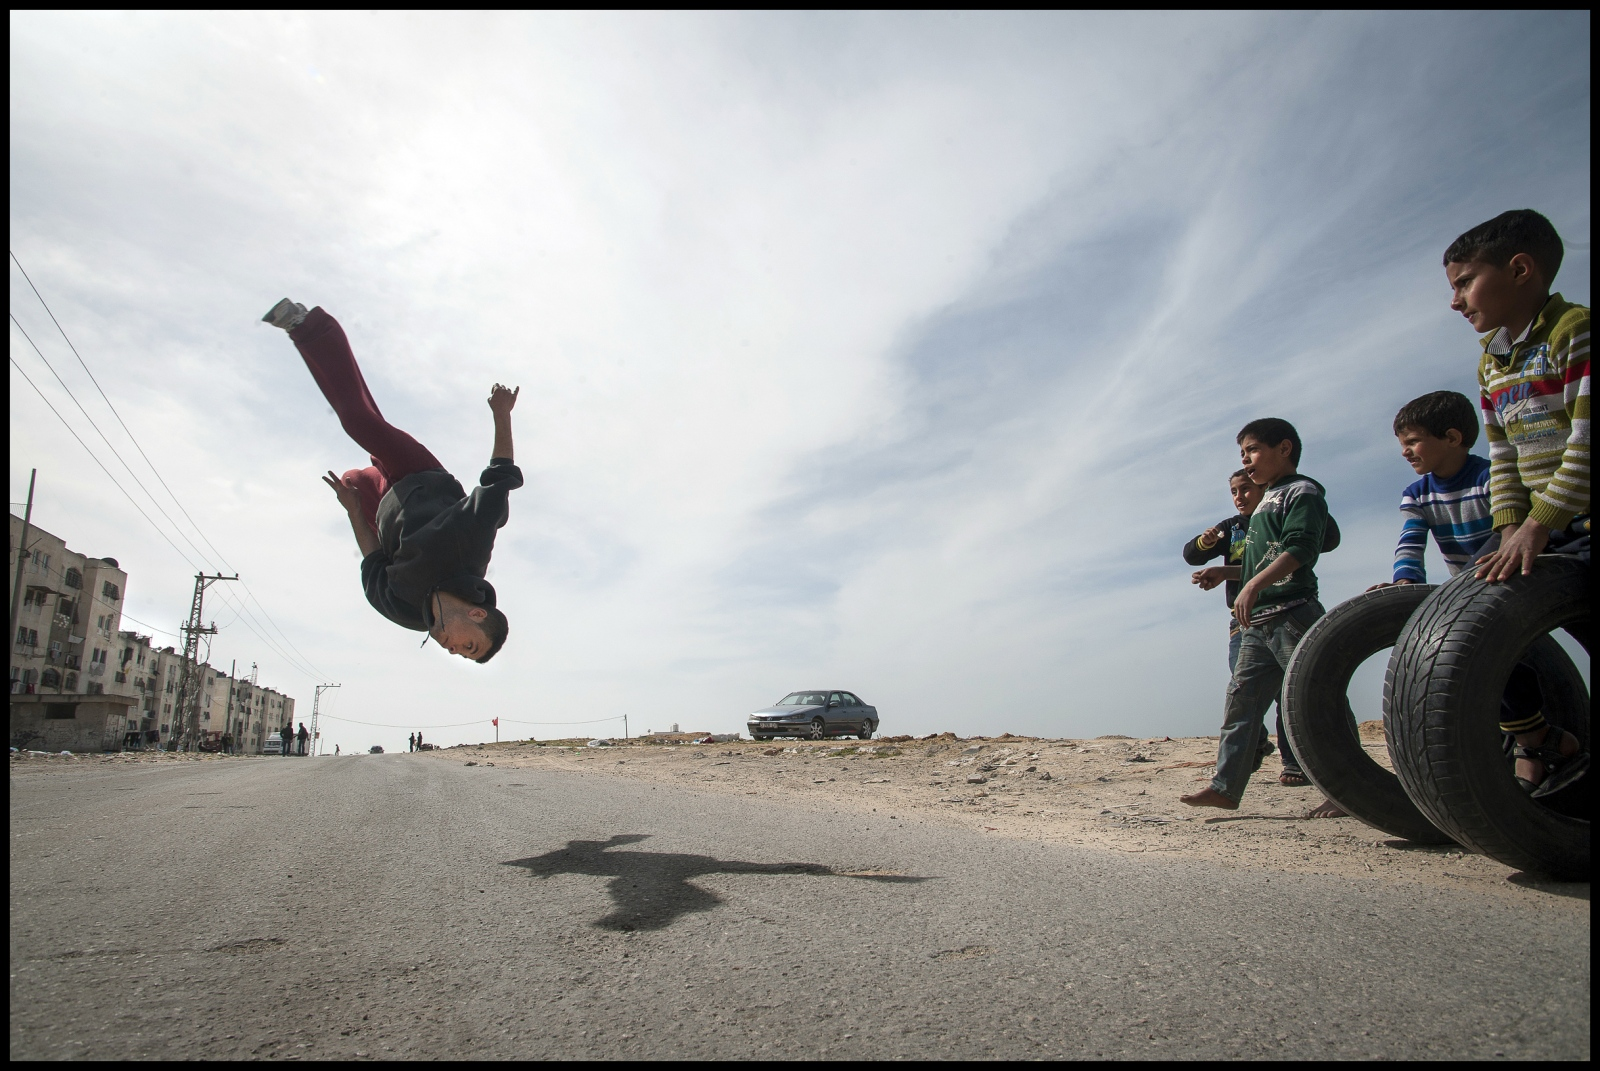 Uday Ajrami of '3 Run Gaza' at Beit Hanoun, Northern Gaza Strip.